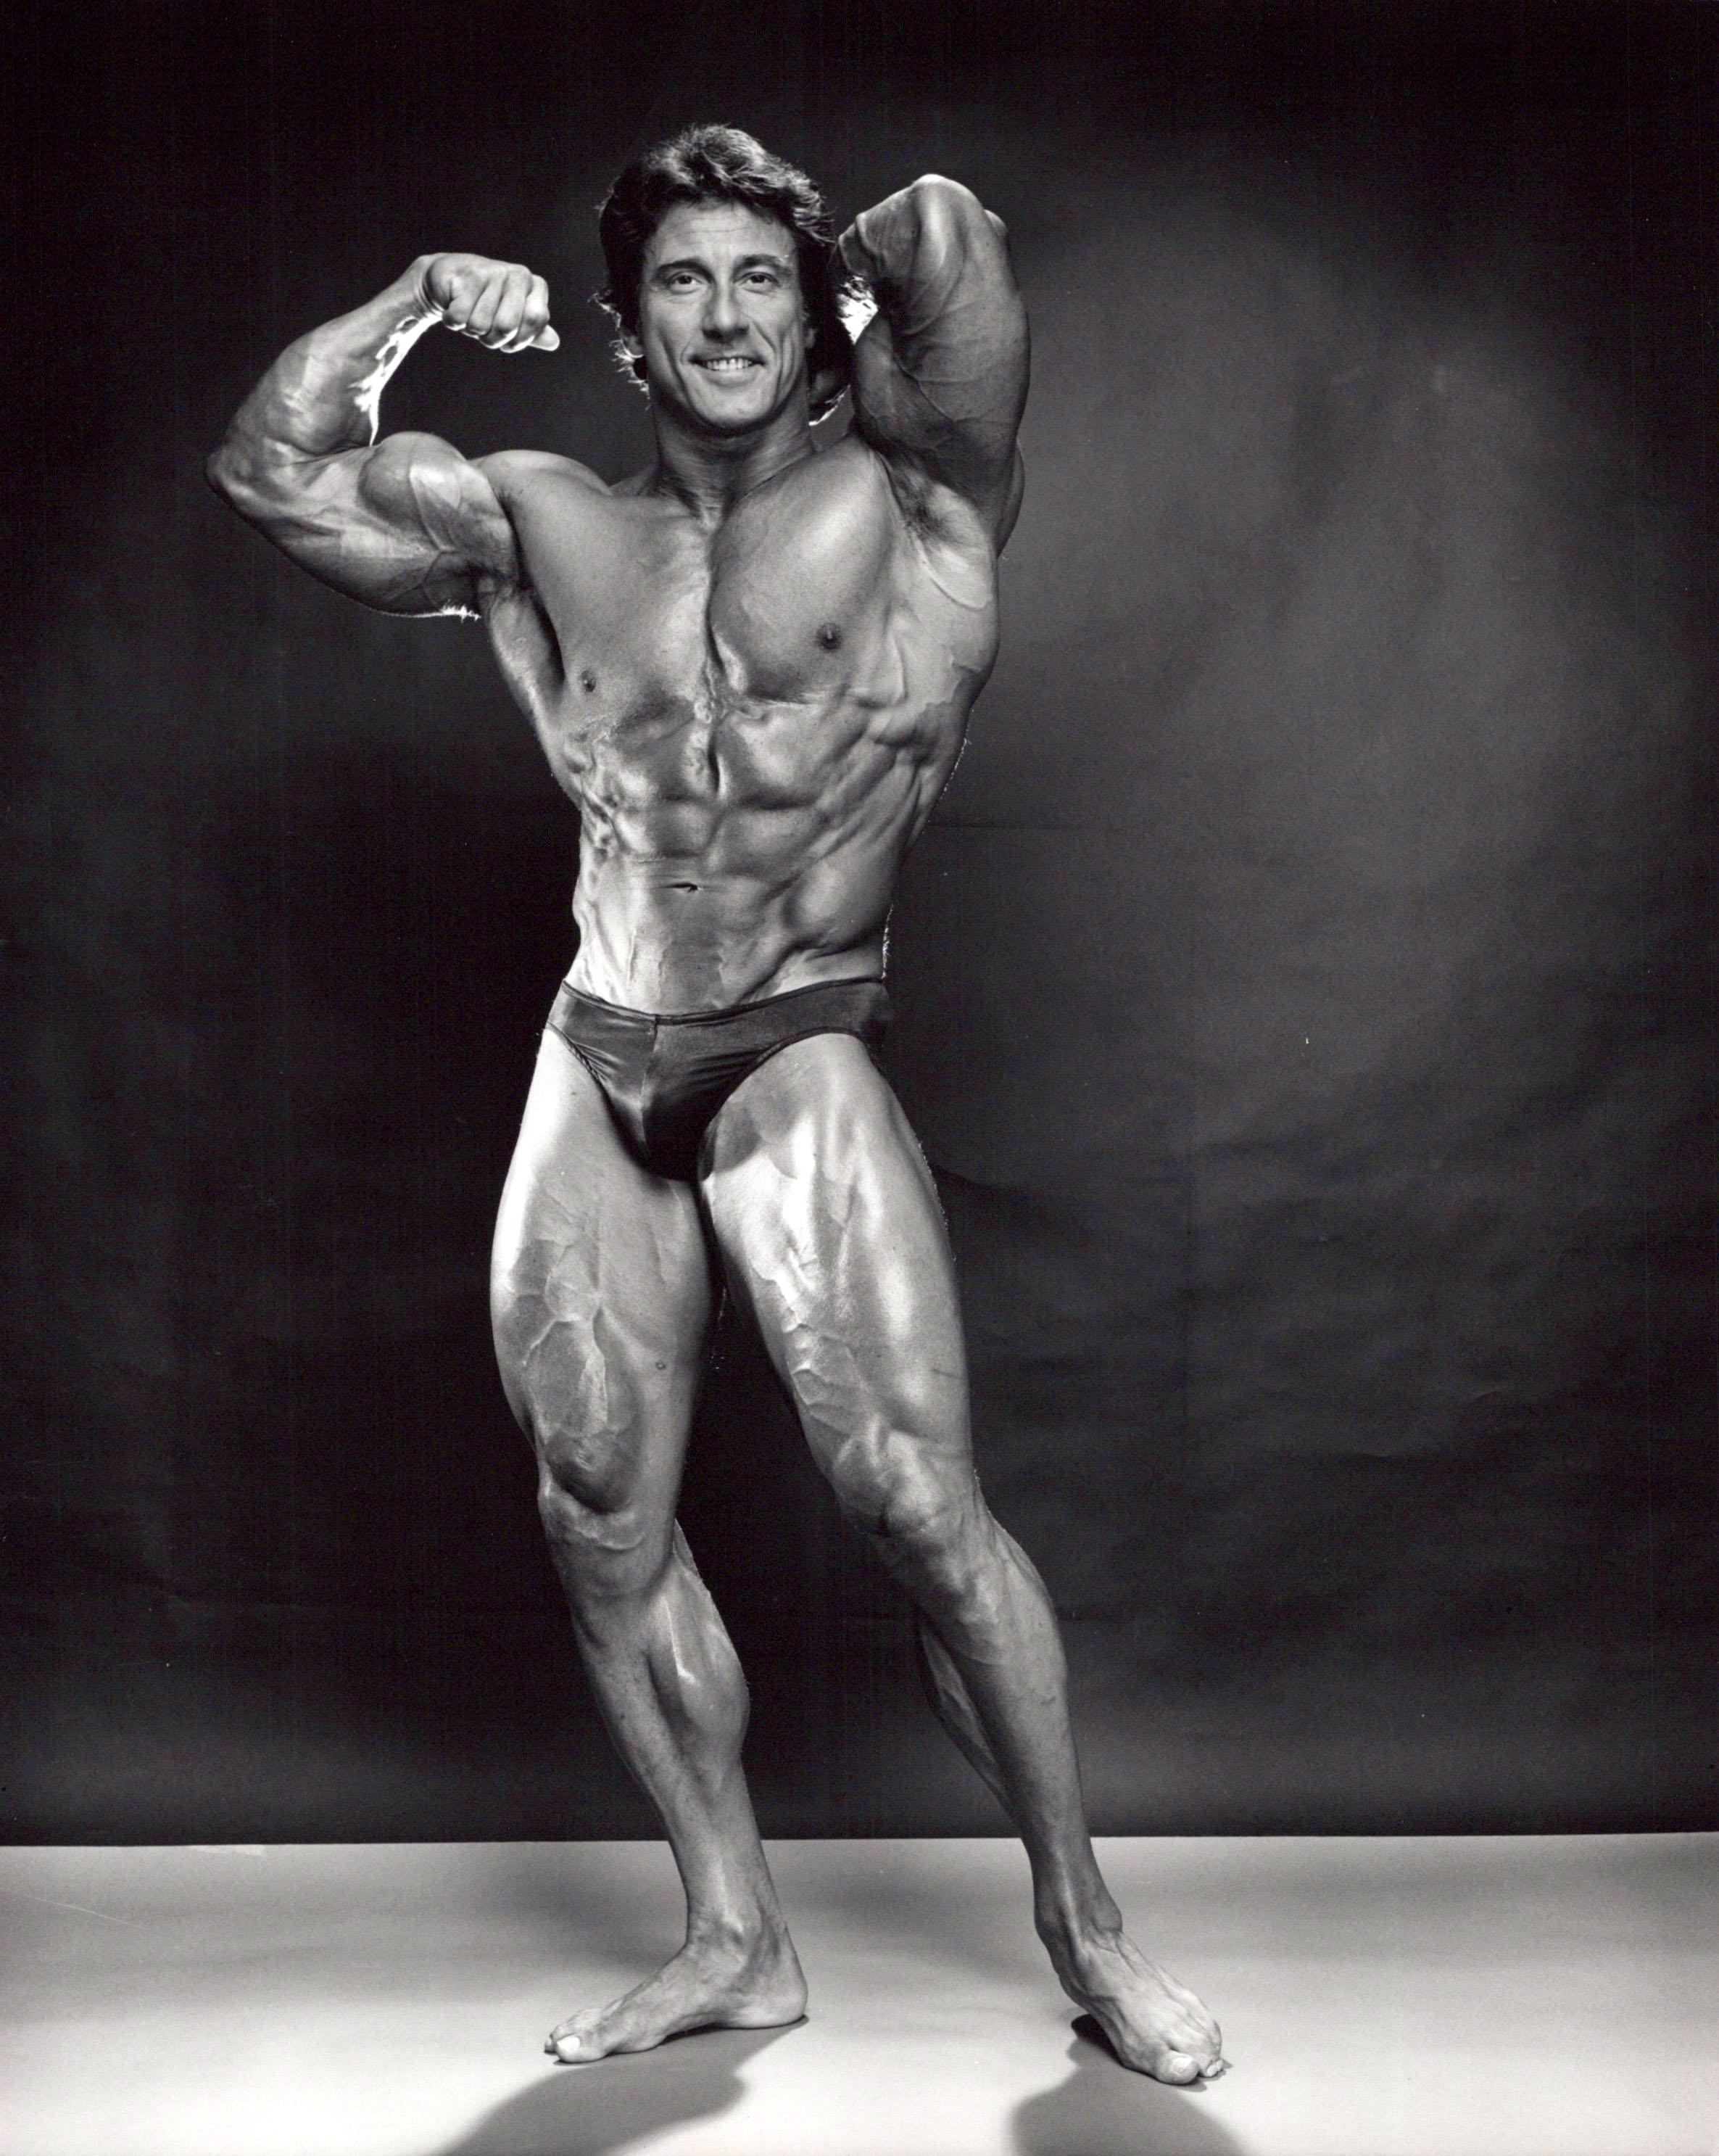 Professional Bodybuilder and three time Mr. Olympia winner Frank Zane